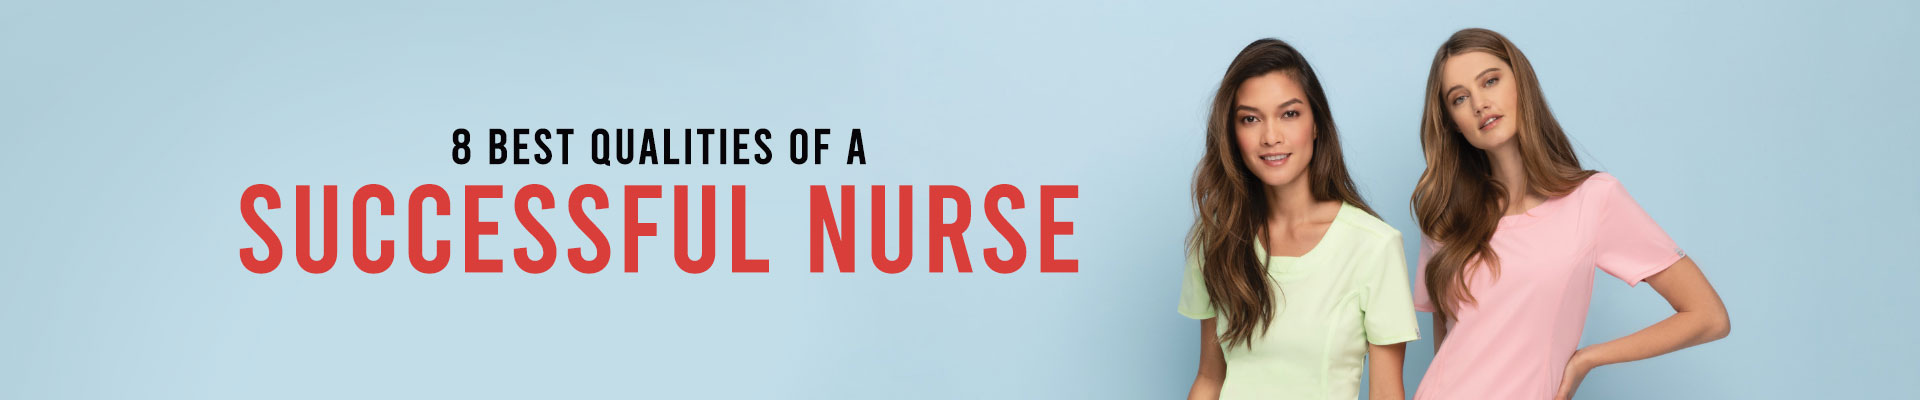 8 Best Qualities Of A Successful Nurse